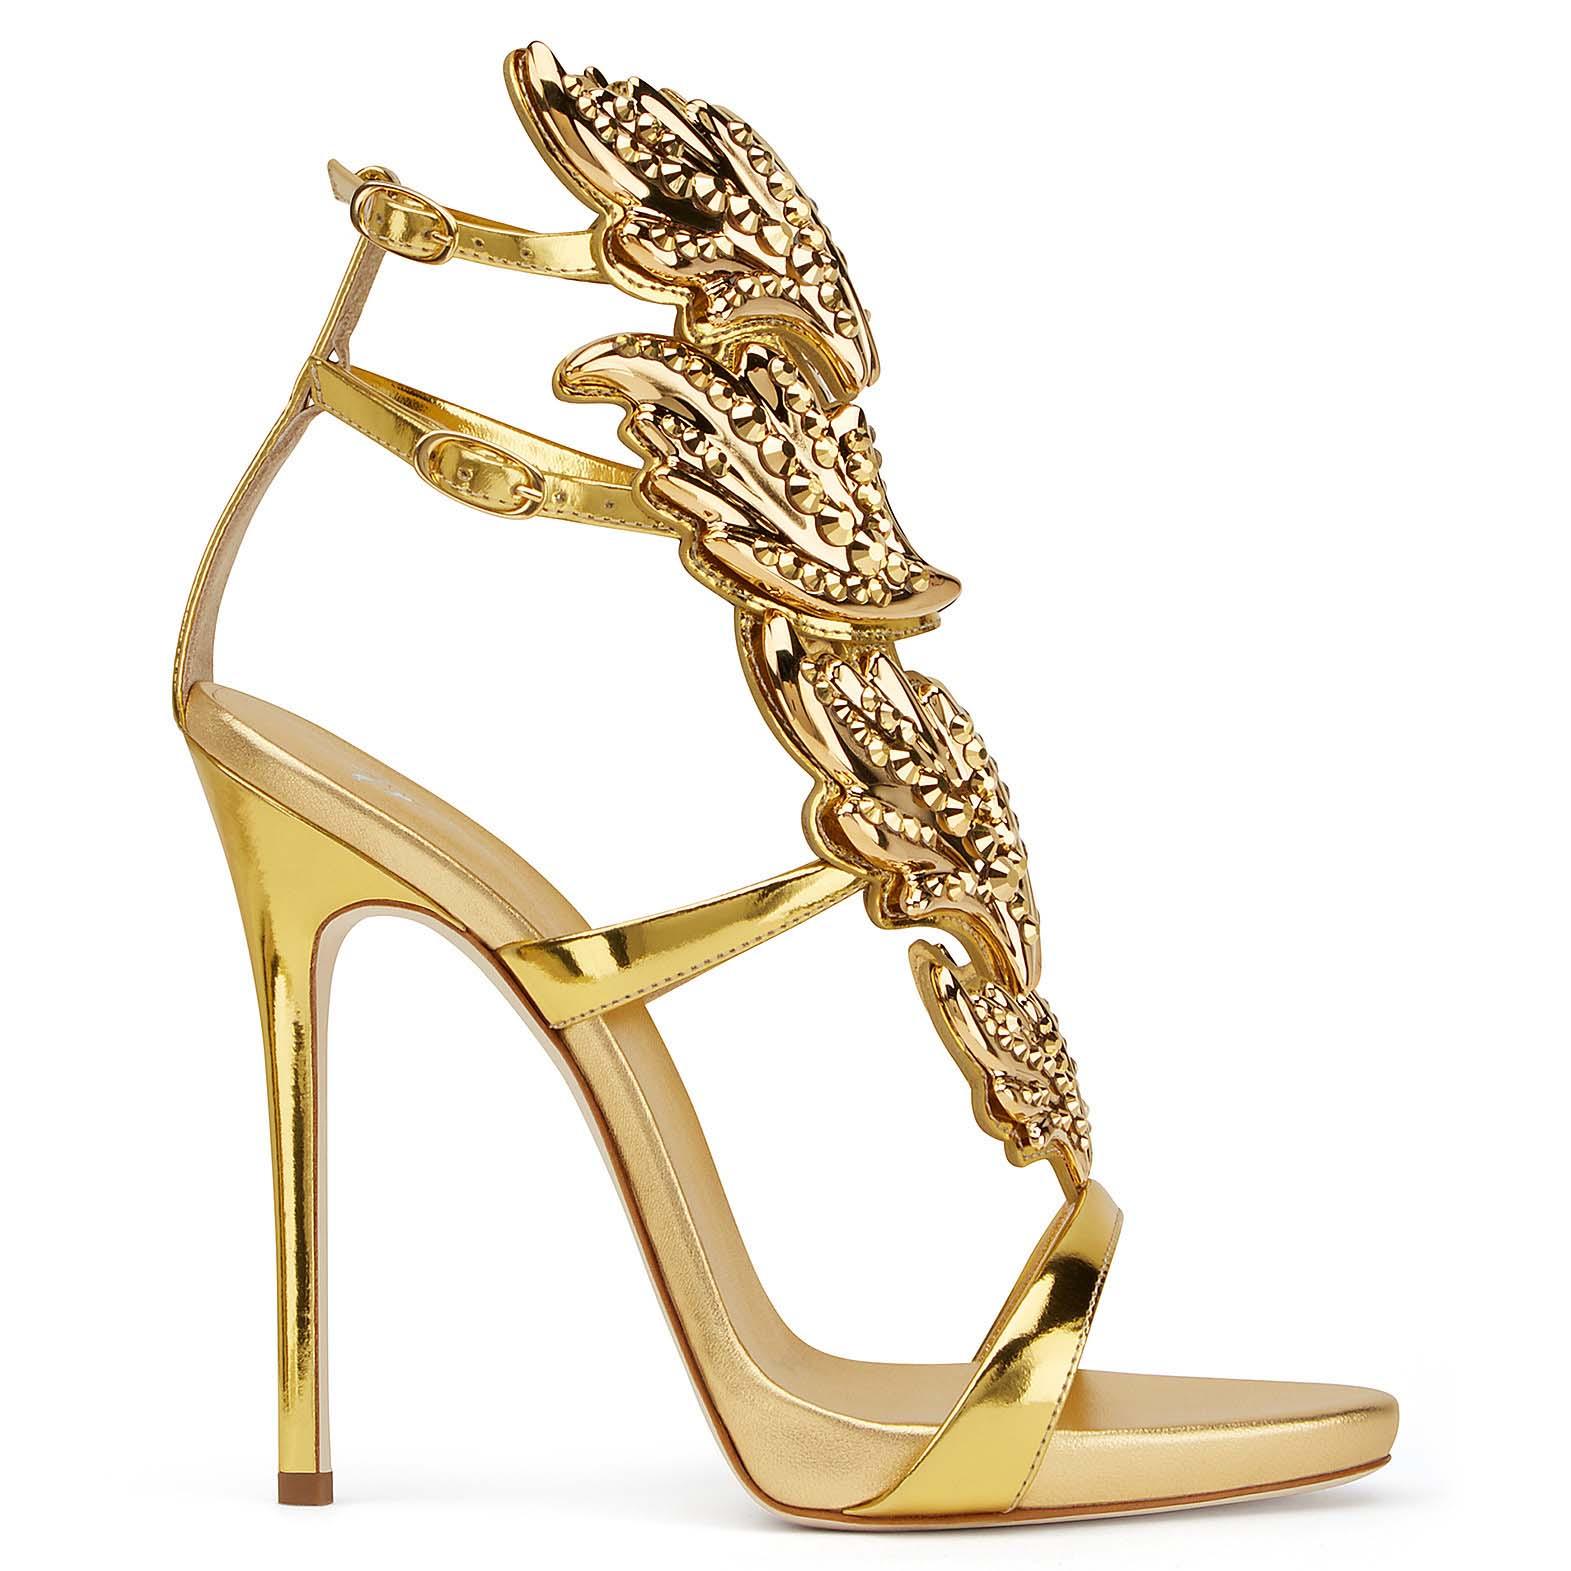 latest-party-wedding-wear-shoes-by-giuseppe-zanotti-2017-11